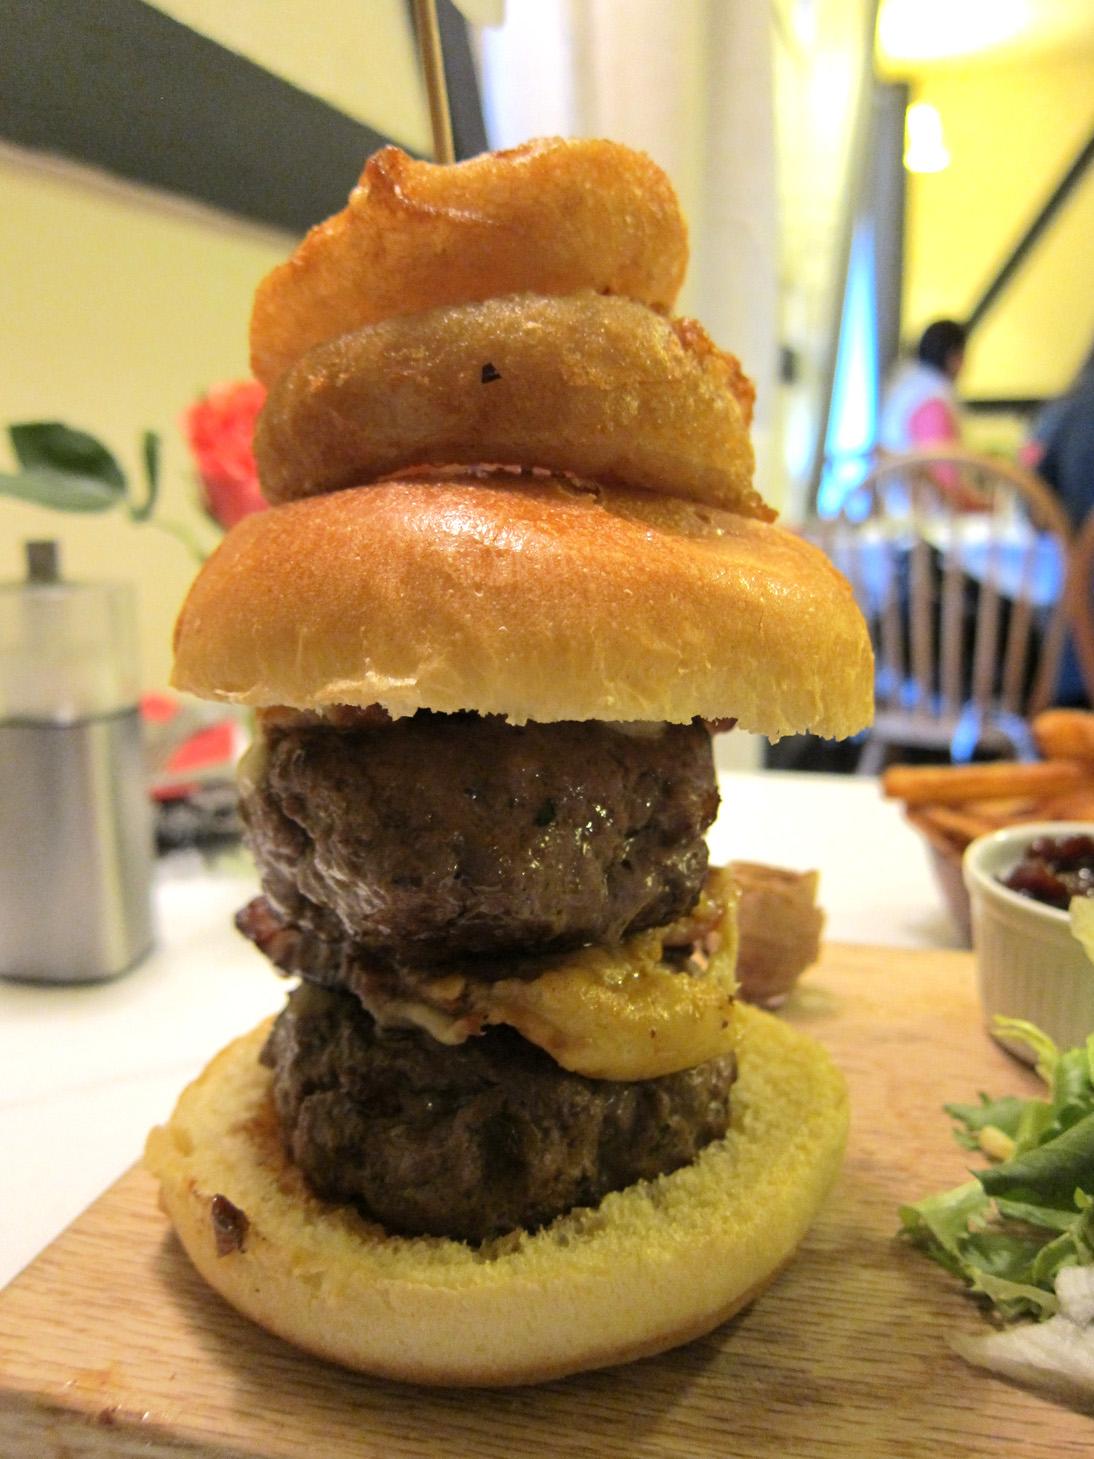 Cyngets_Wrexham Burger Challenge